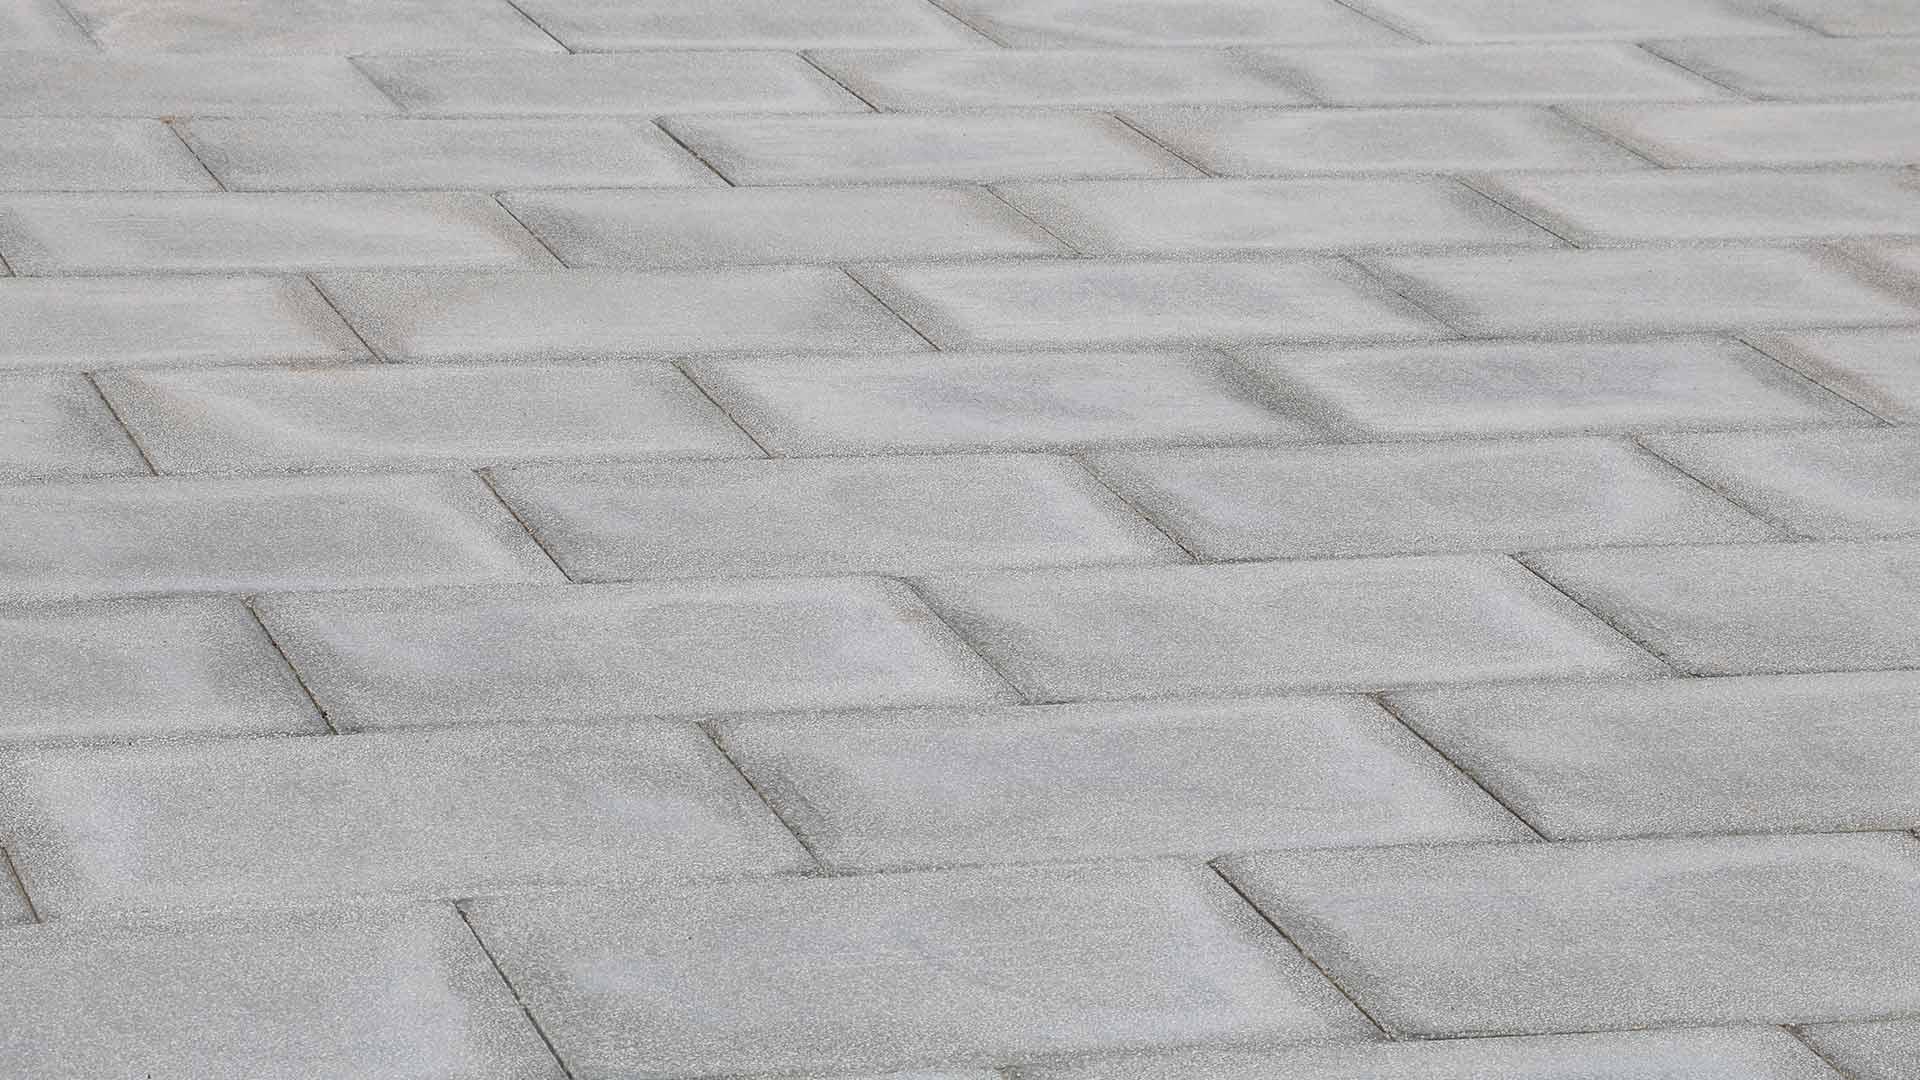 pujol-paviments-terratzo-exterior-masia-5